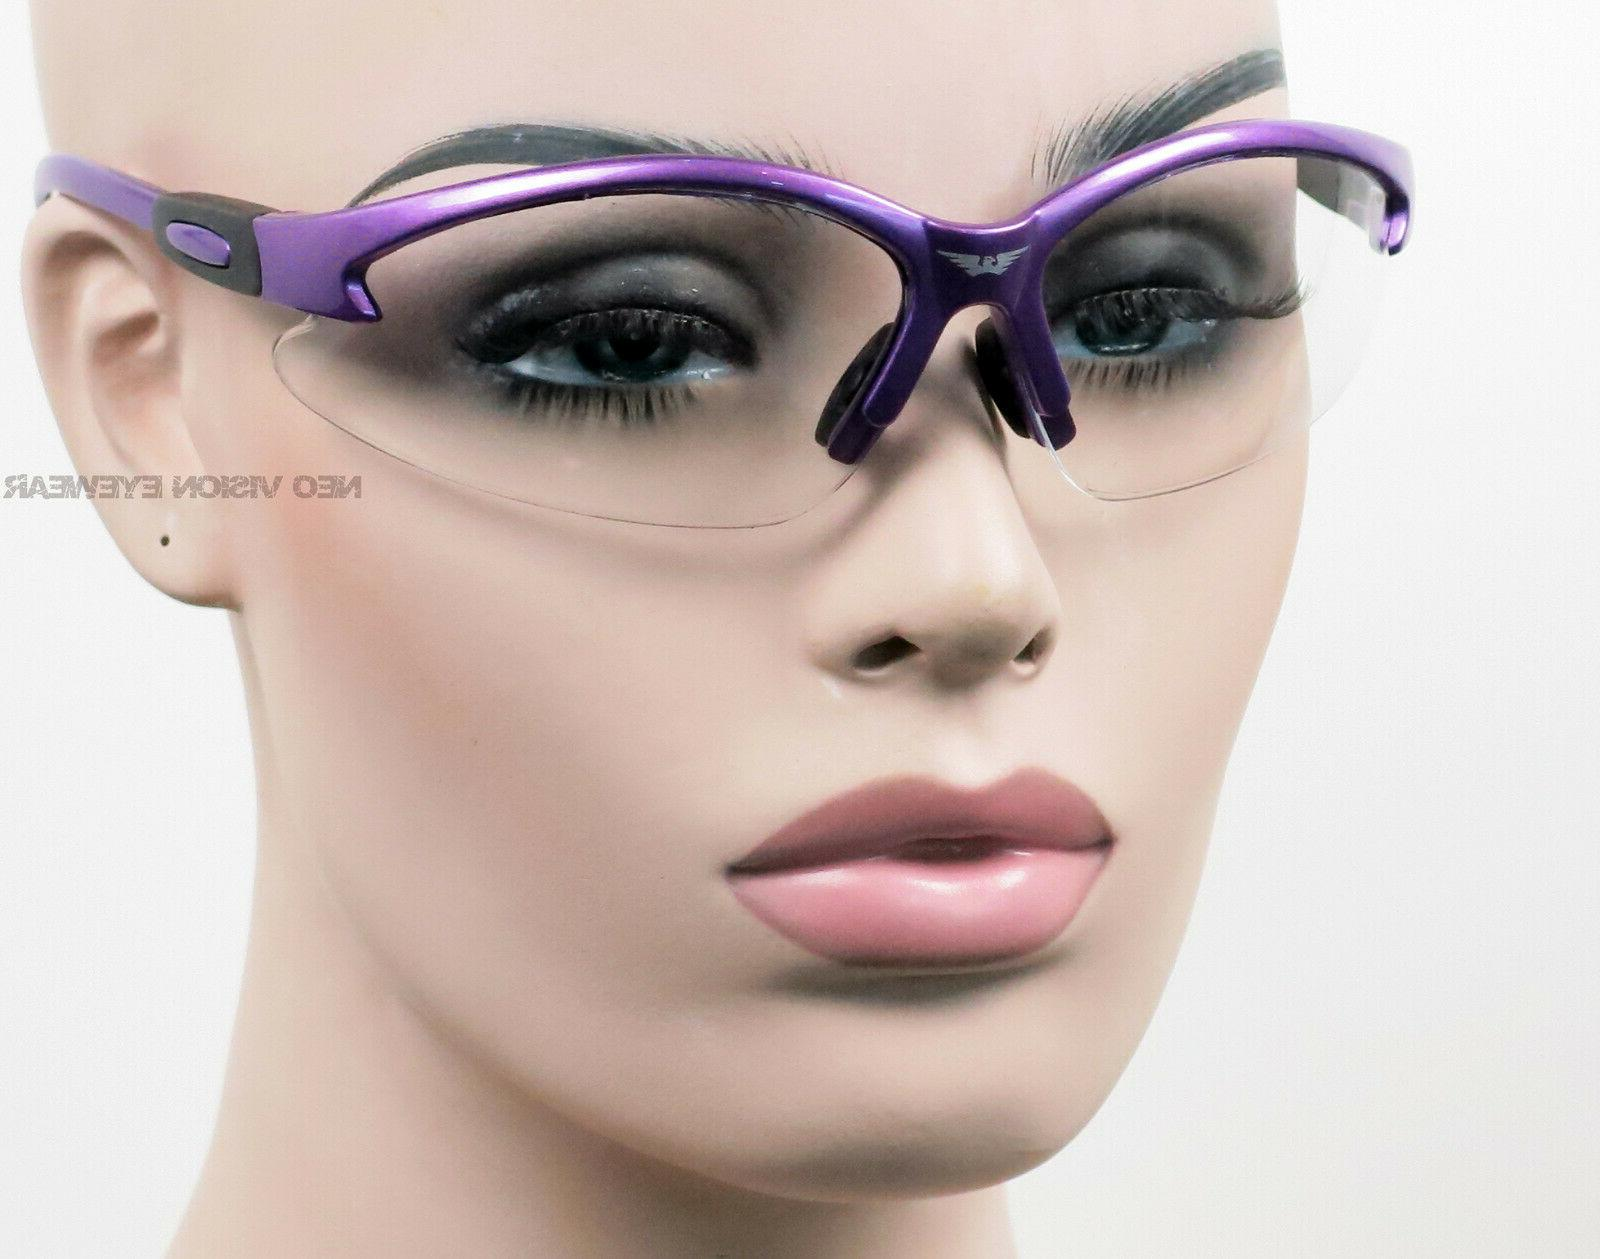 Global Frame Clear Lens Glasses Motorcycle Z87+